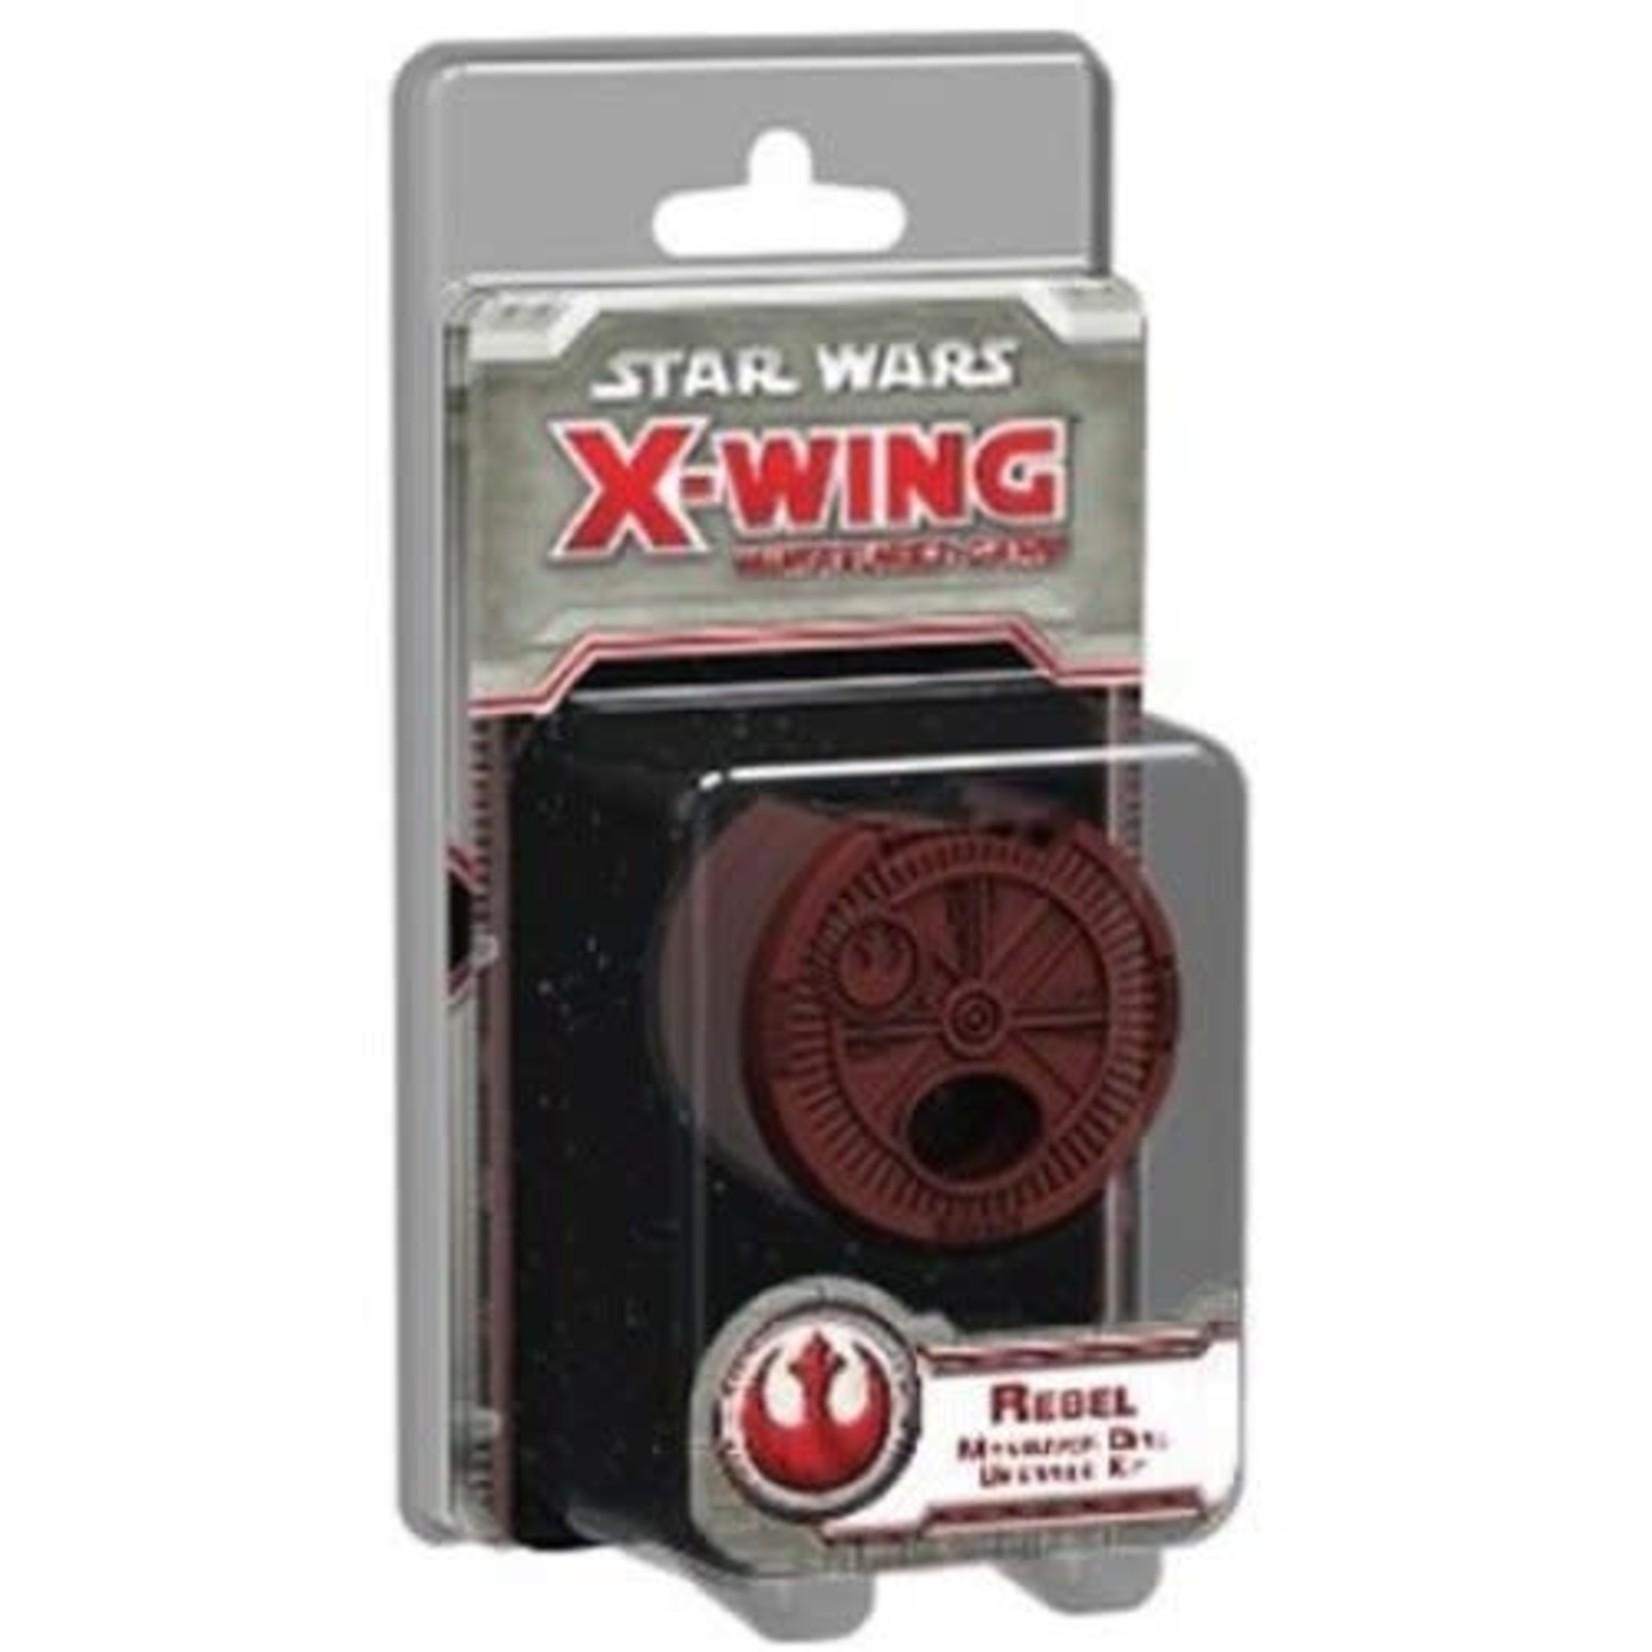 Fantasy Flight Games Star Wars X-Wing 1st Edition: Rebel Maneuver Dial